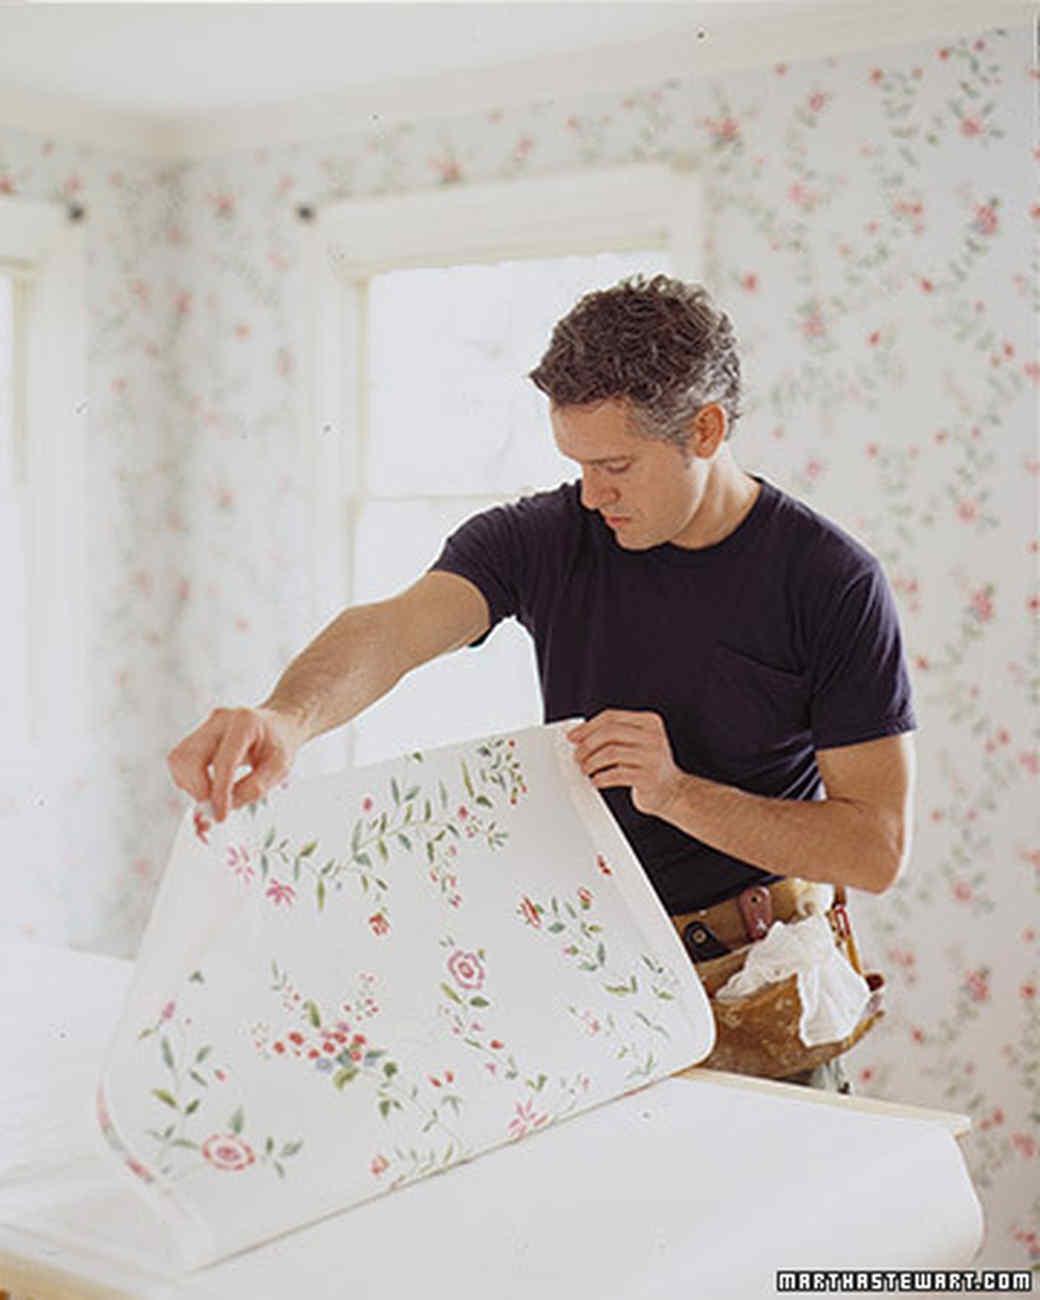 how to hang wallpaper How to Hang Wallpaper | Martha Stewart how to hang wallpaper